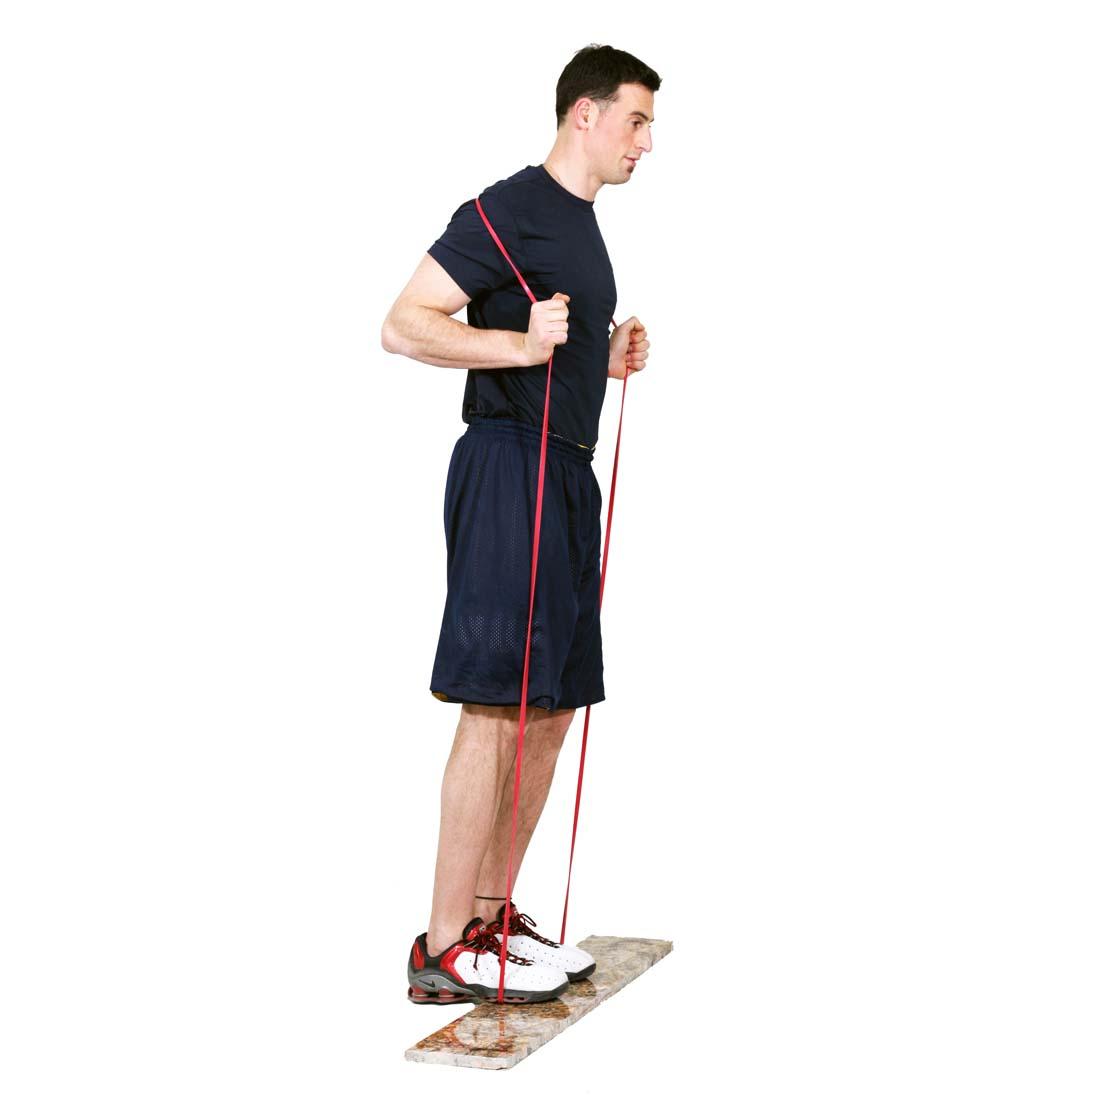 Band Exercises for Legs - Leg Day Workouts | Rubberbanditz